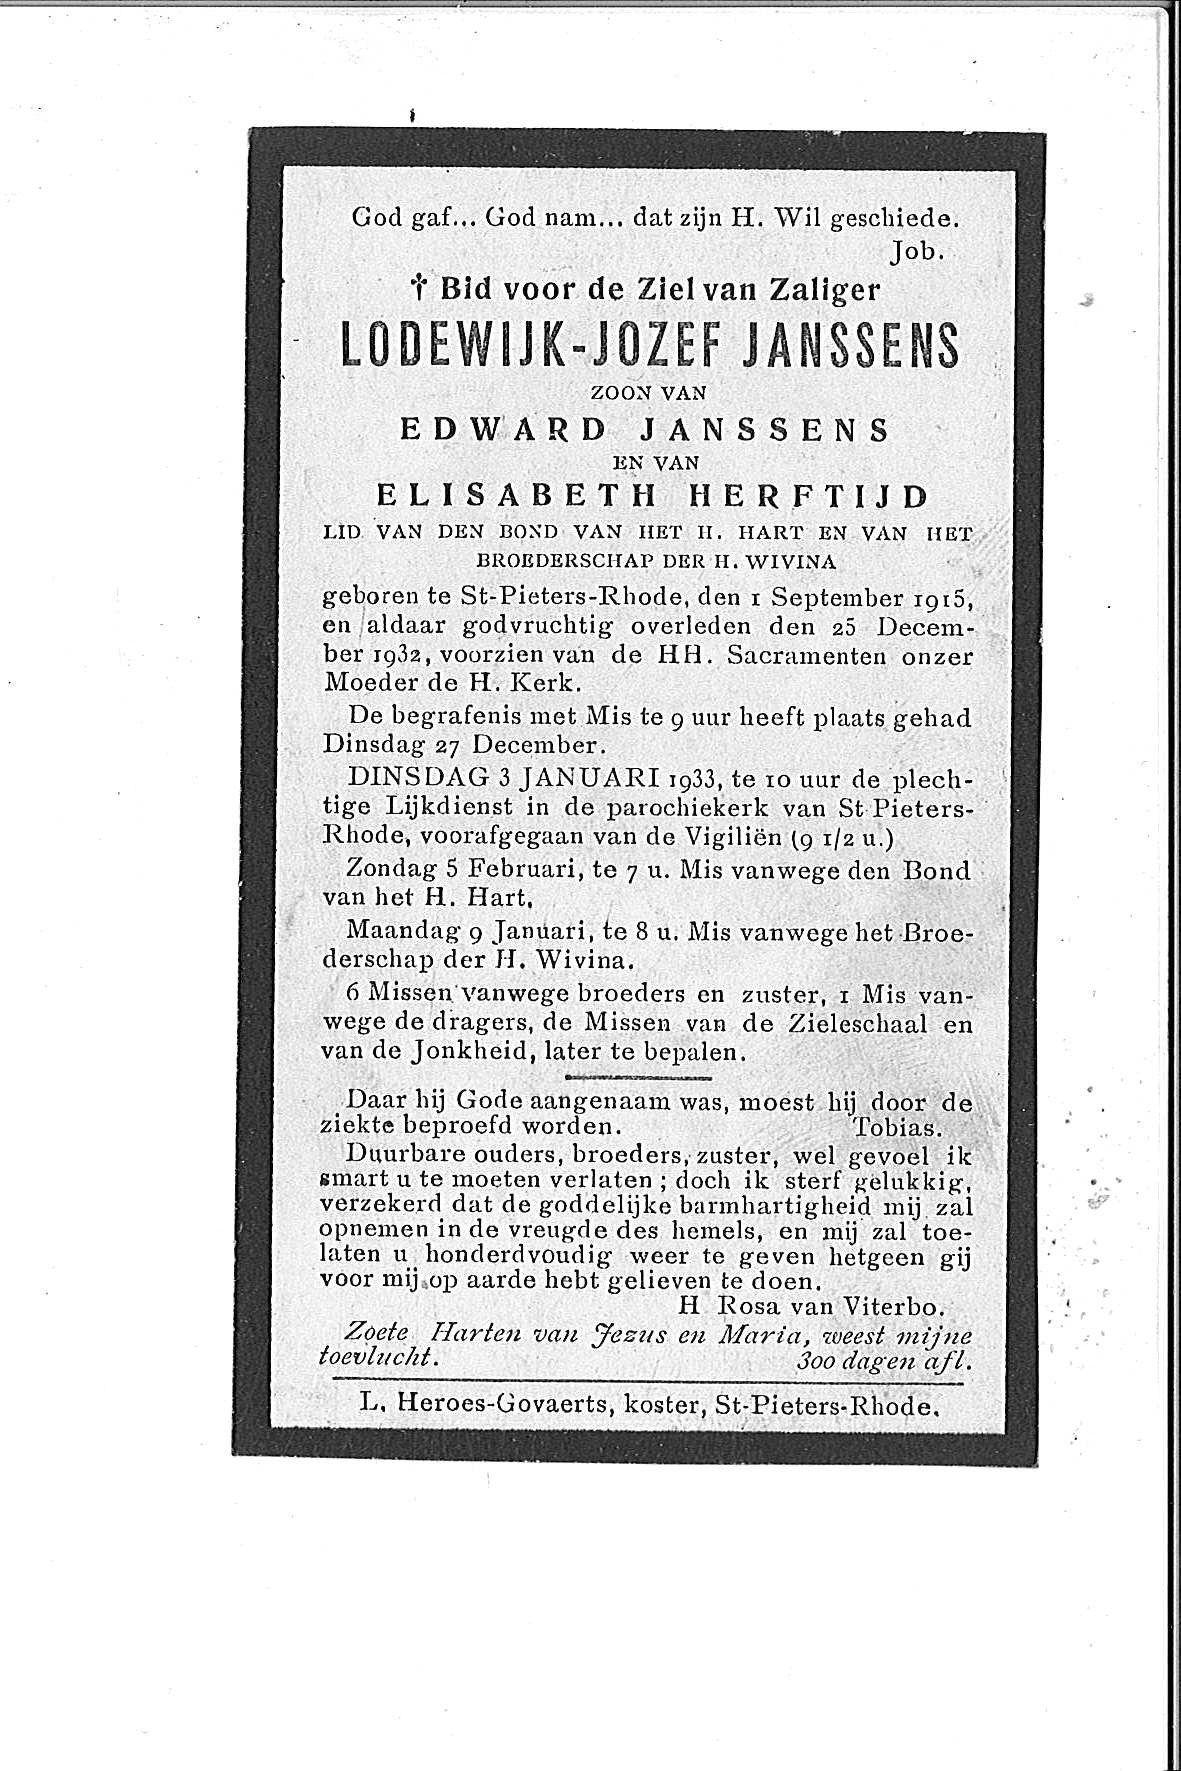 Lodewijk-Jozef(1932)20150428102828_00014.jpg